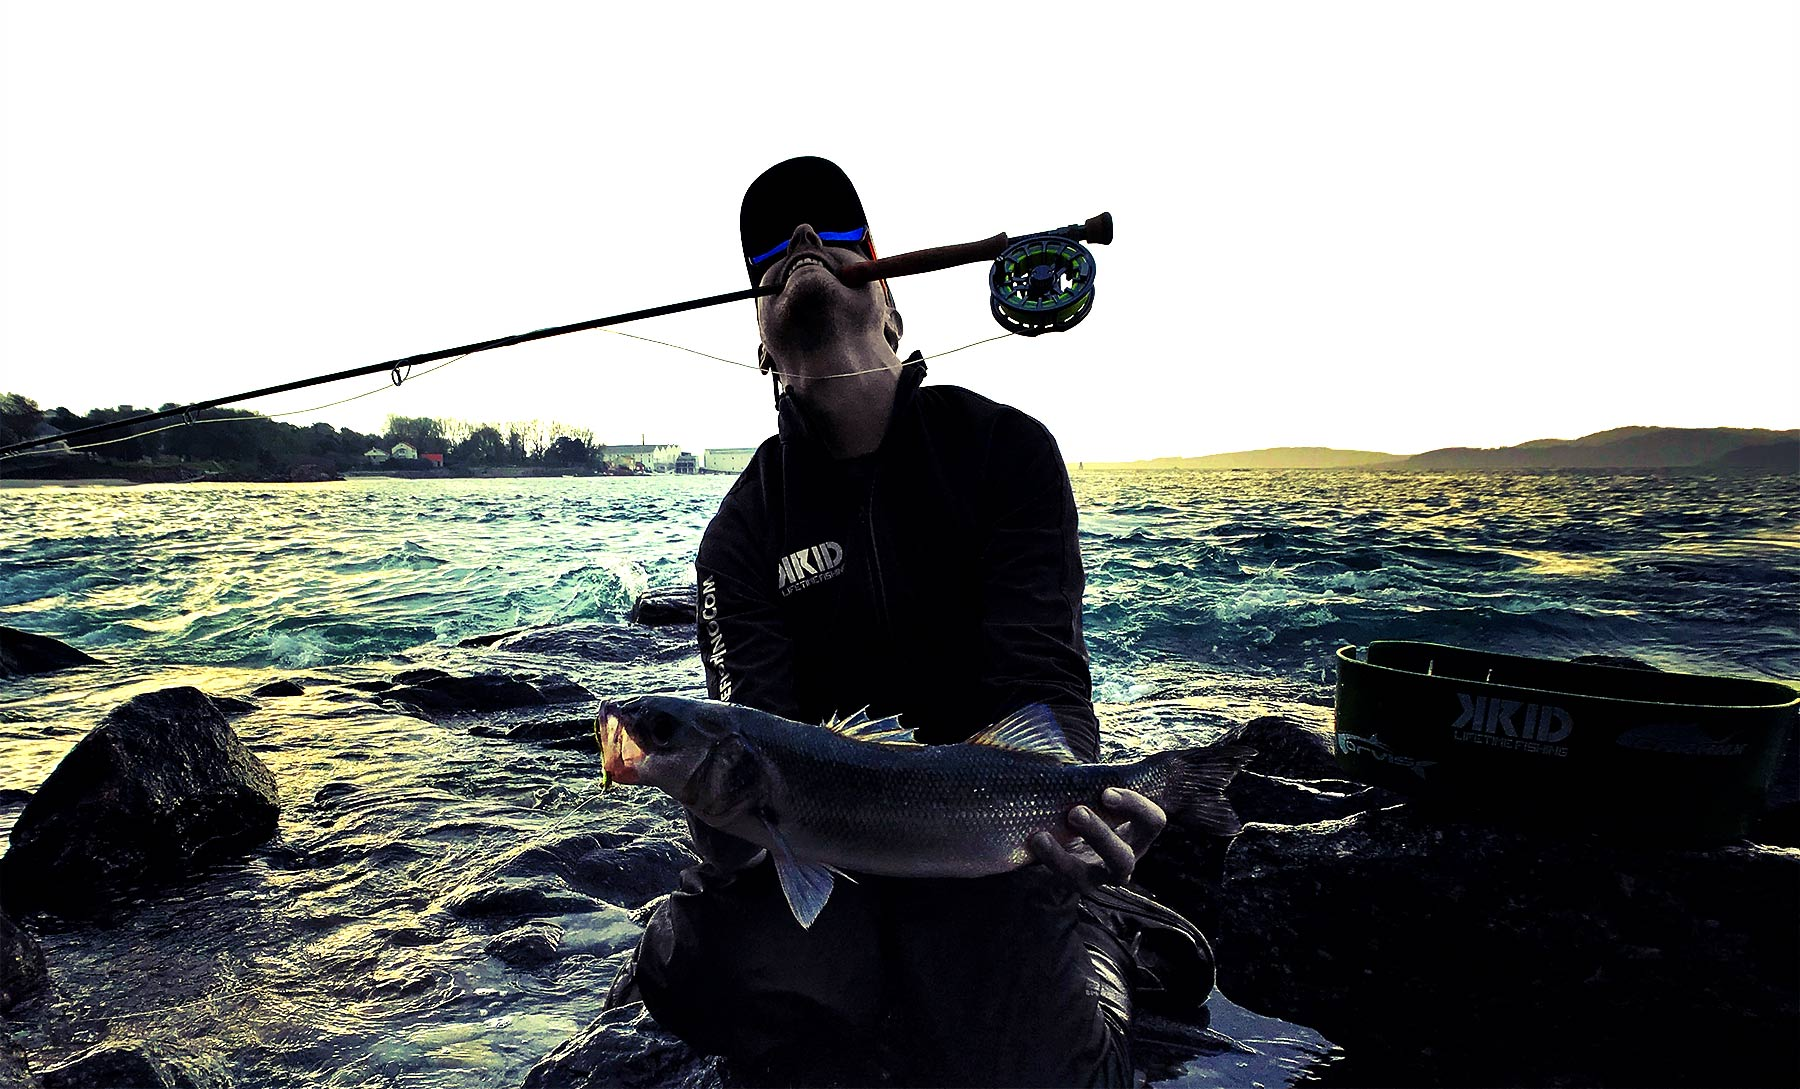 Galerías - KRID Lifetime Fishing